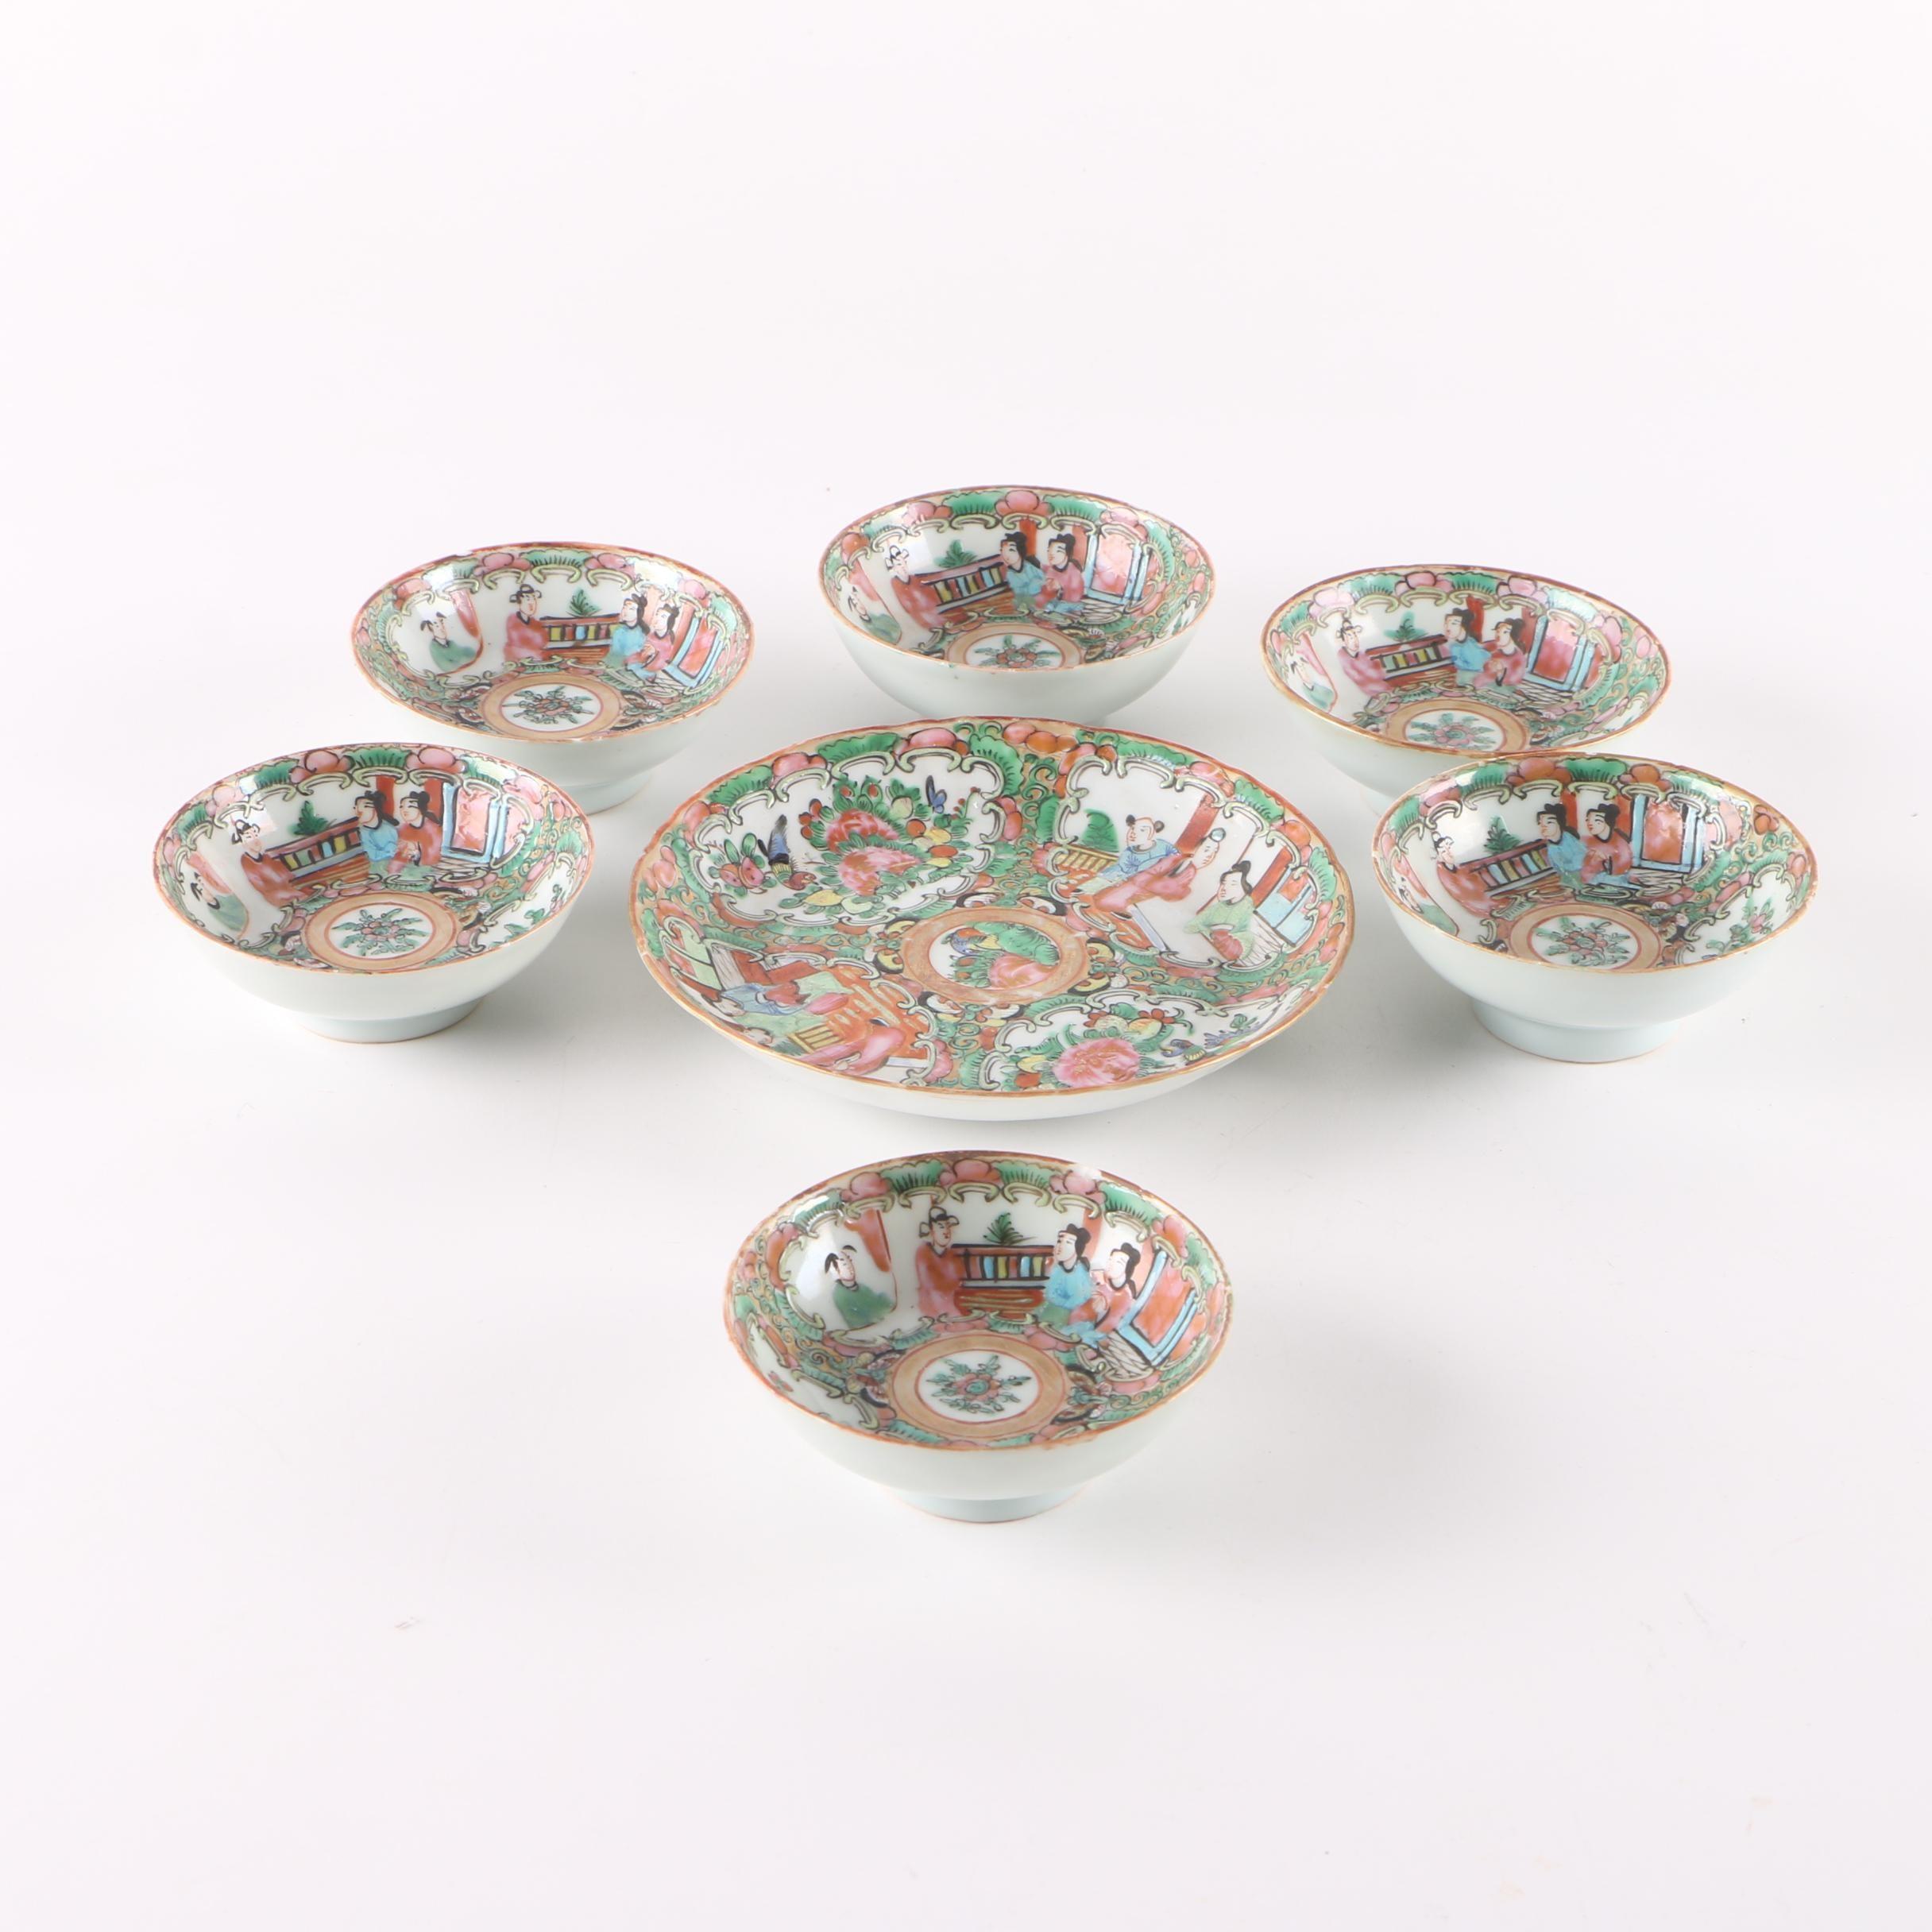 Chinese Rose Medallion Porcelain Serveware Set